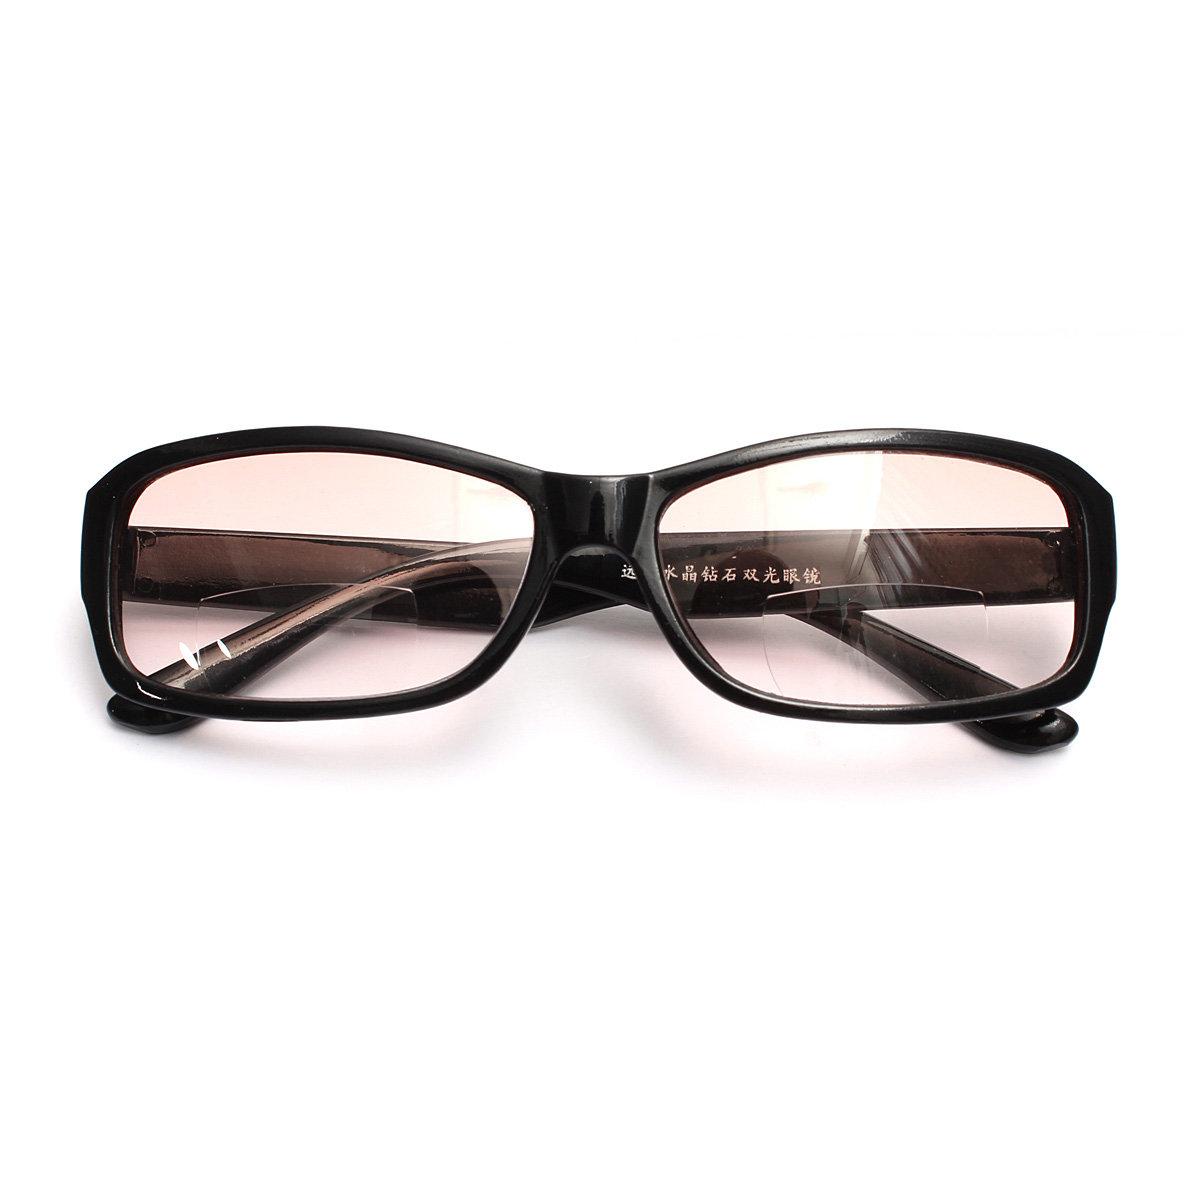 New Black Bifocal Reading Eyeglasses Sunglasses Reading Eyeglasses Double Function Glasses Eye Care